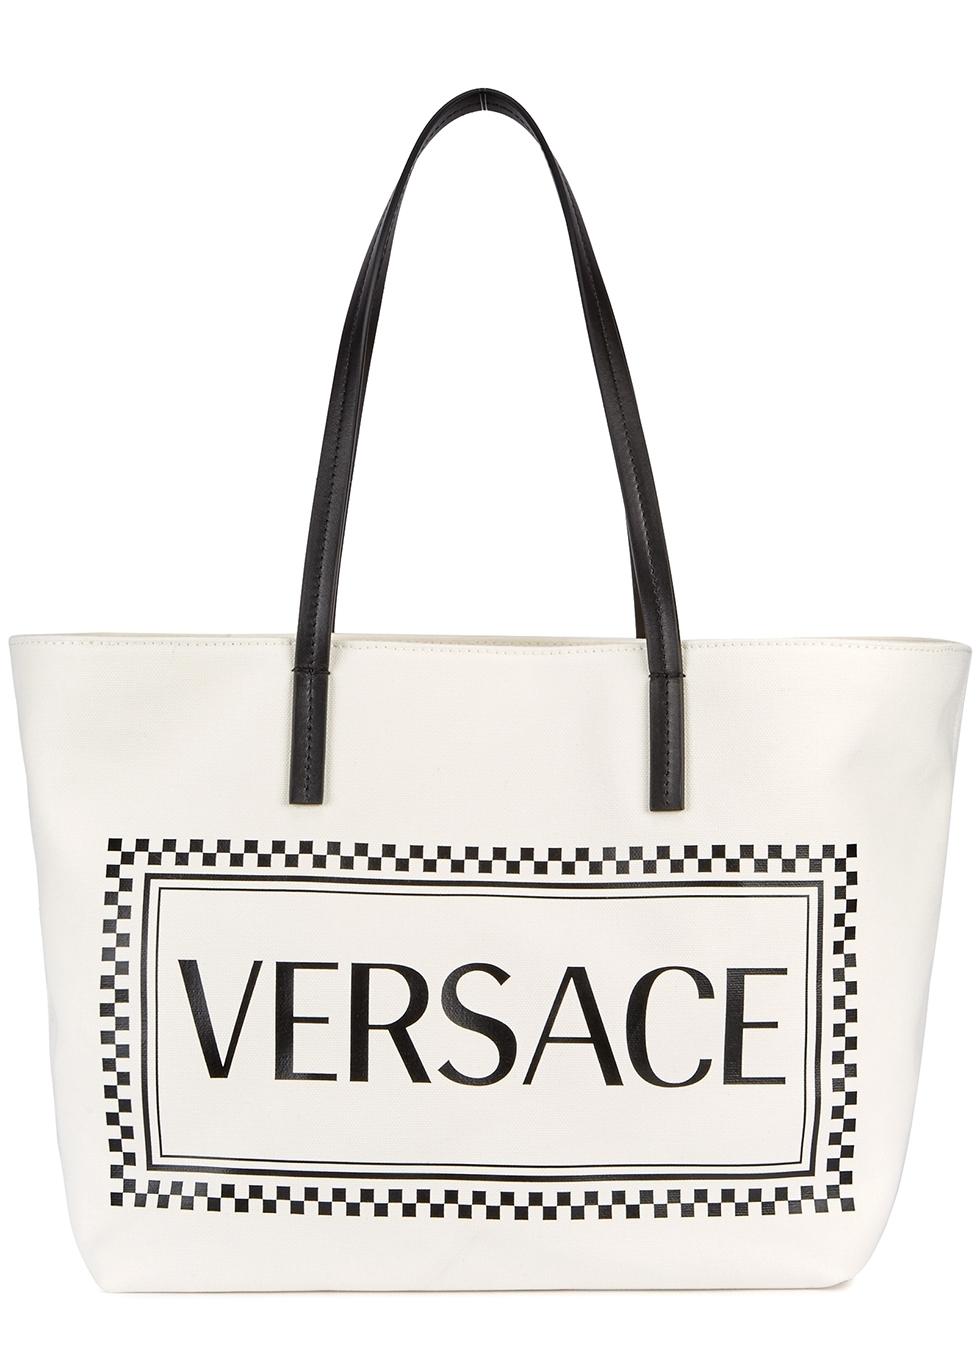 755b60df5081 Versace Shoes